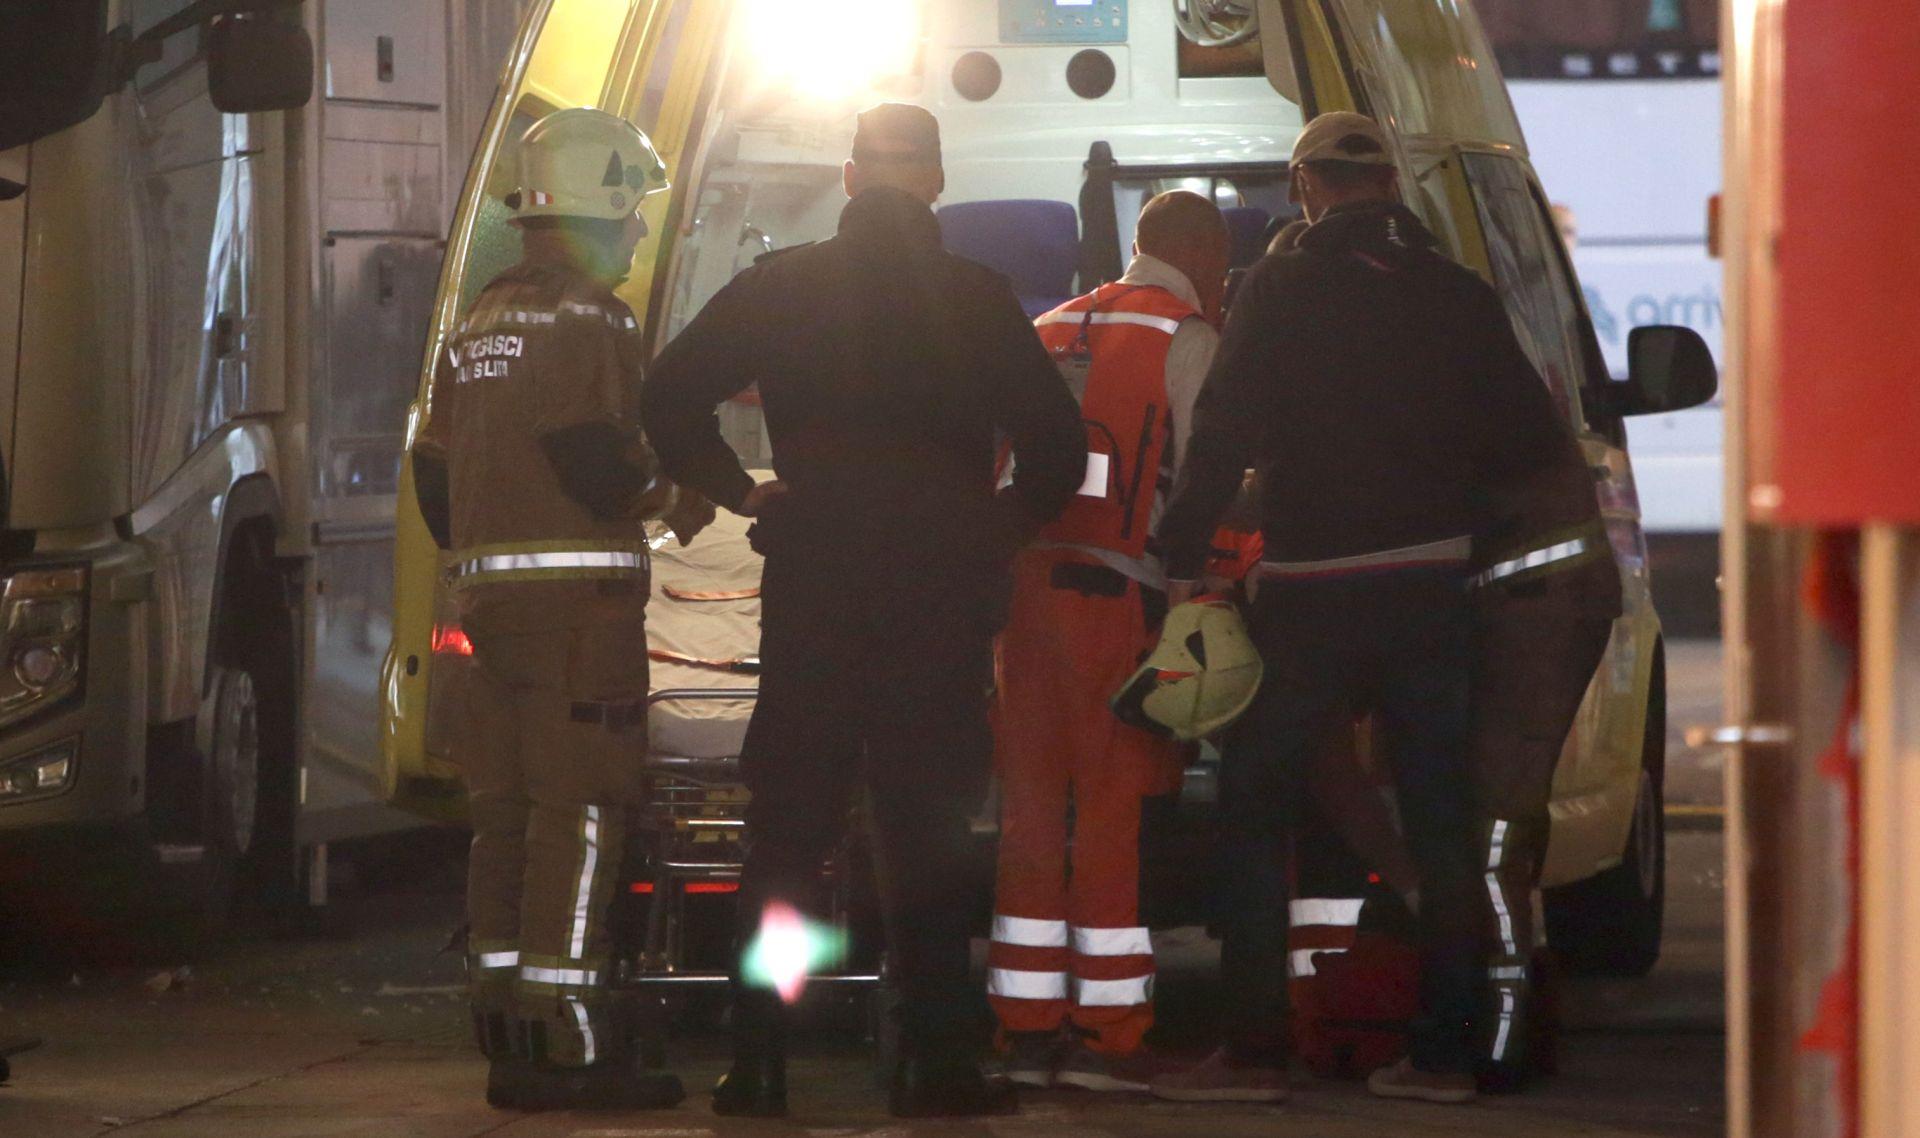 RANJEN NA POLJUDU Vatrogasac u bolnici, dvije osobe privedene zbog zloupotrebe pirotehnike